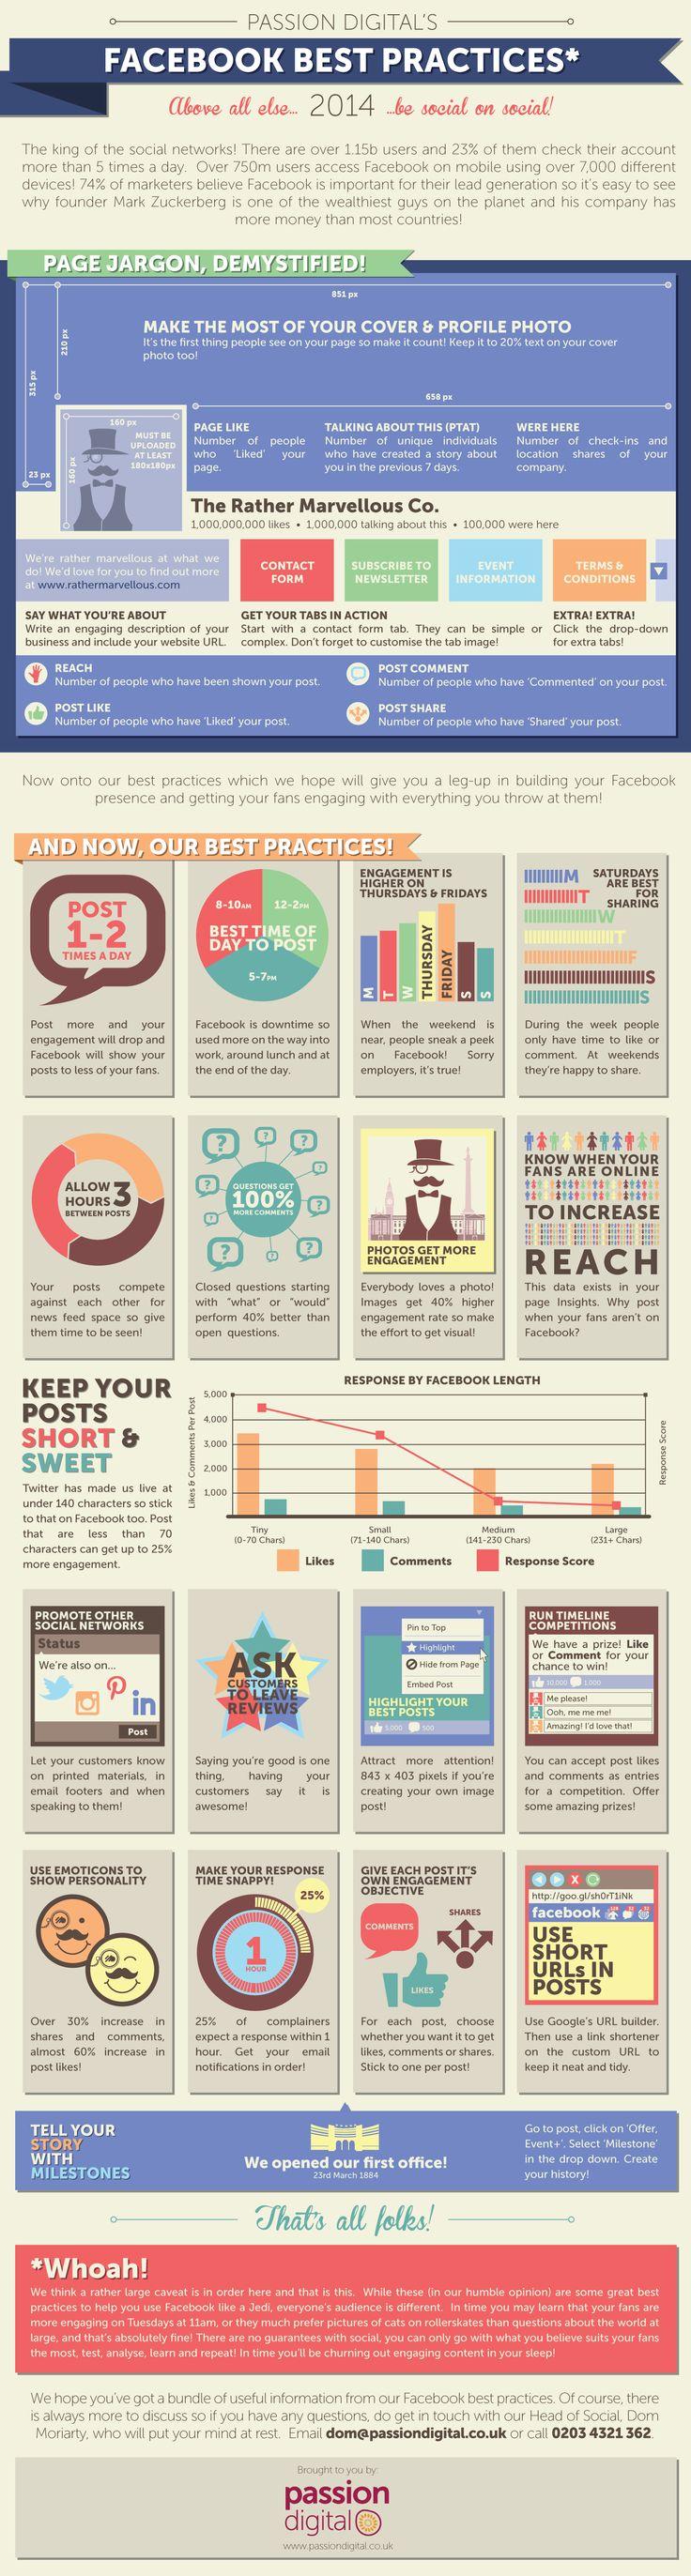 Facebook Best Practices for 2014 -   #Infographic #Facebook #SocialMedia